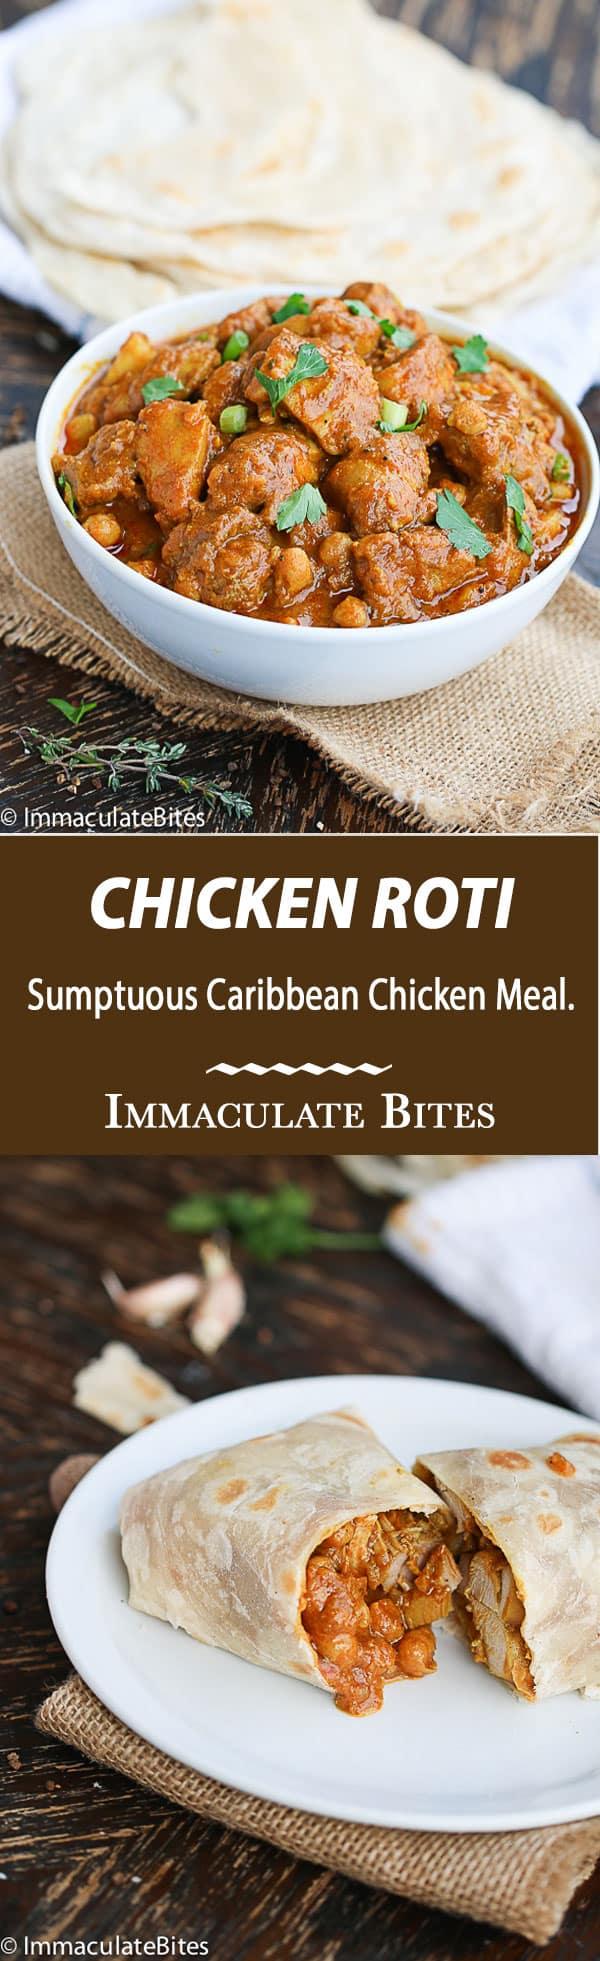 Trinidad Chicken Roti - Immaculate Bites